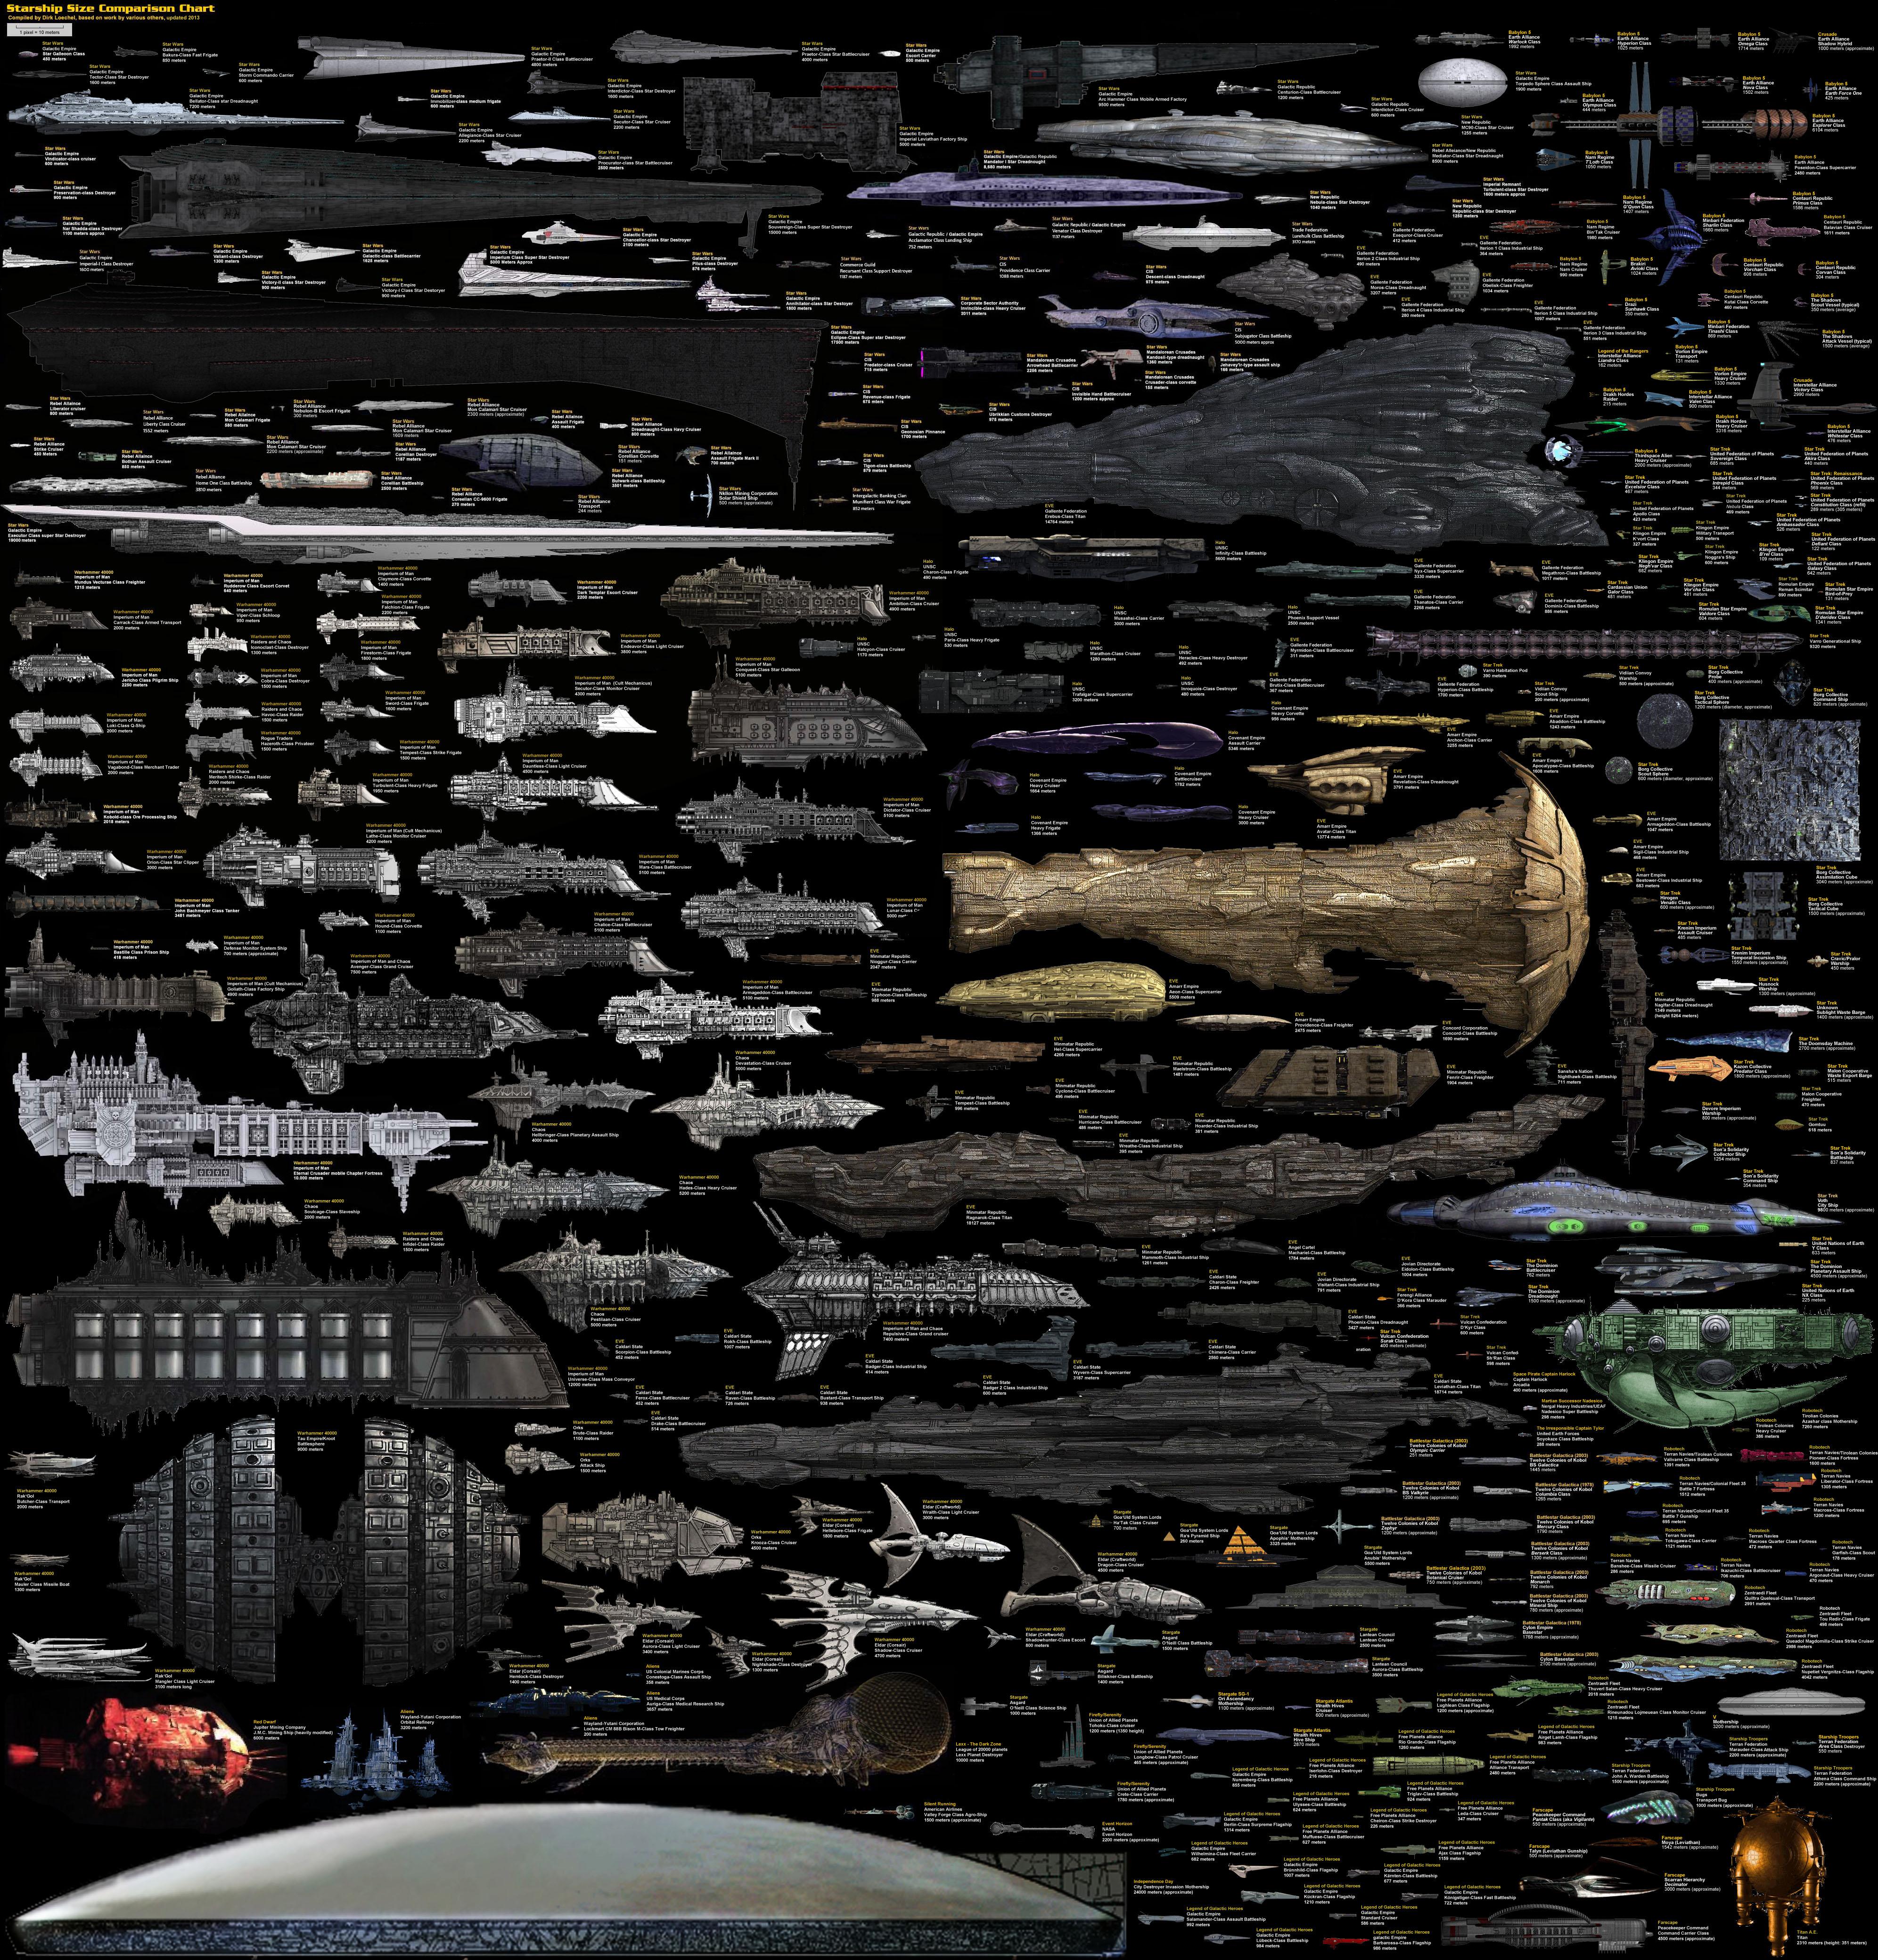 Star trek star wars independence day qui a le plus - Stars wars vaisseau ...